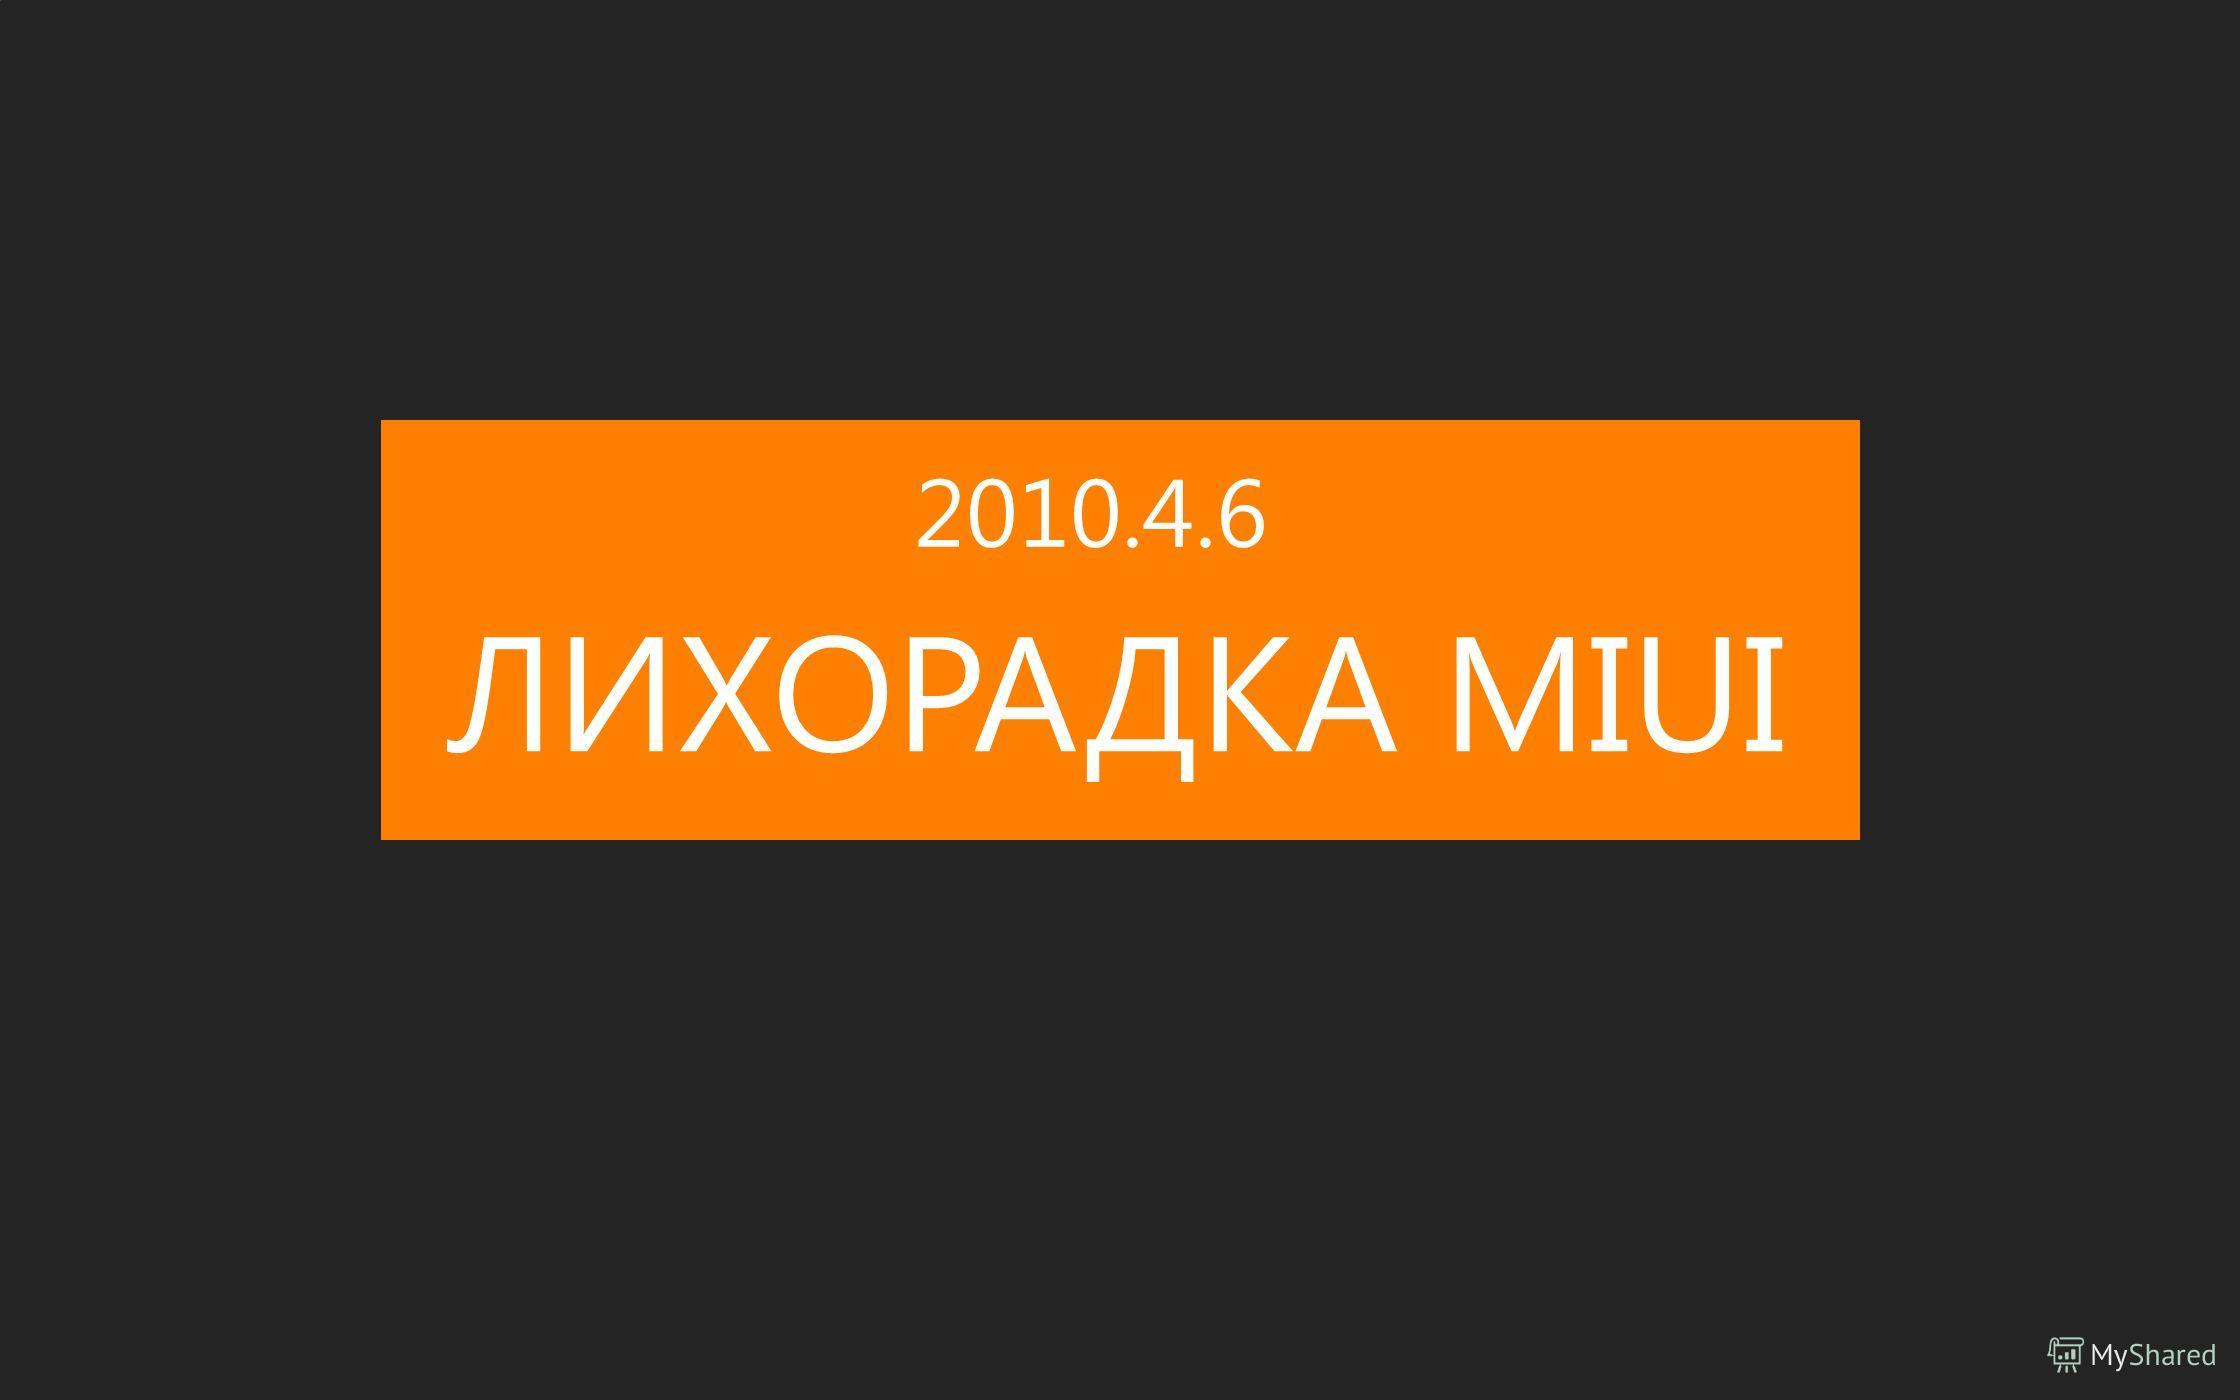 2010.4.6 ЛИХОРАДКА MIUI